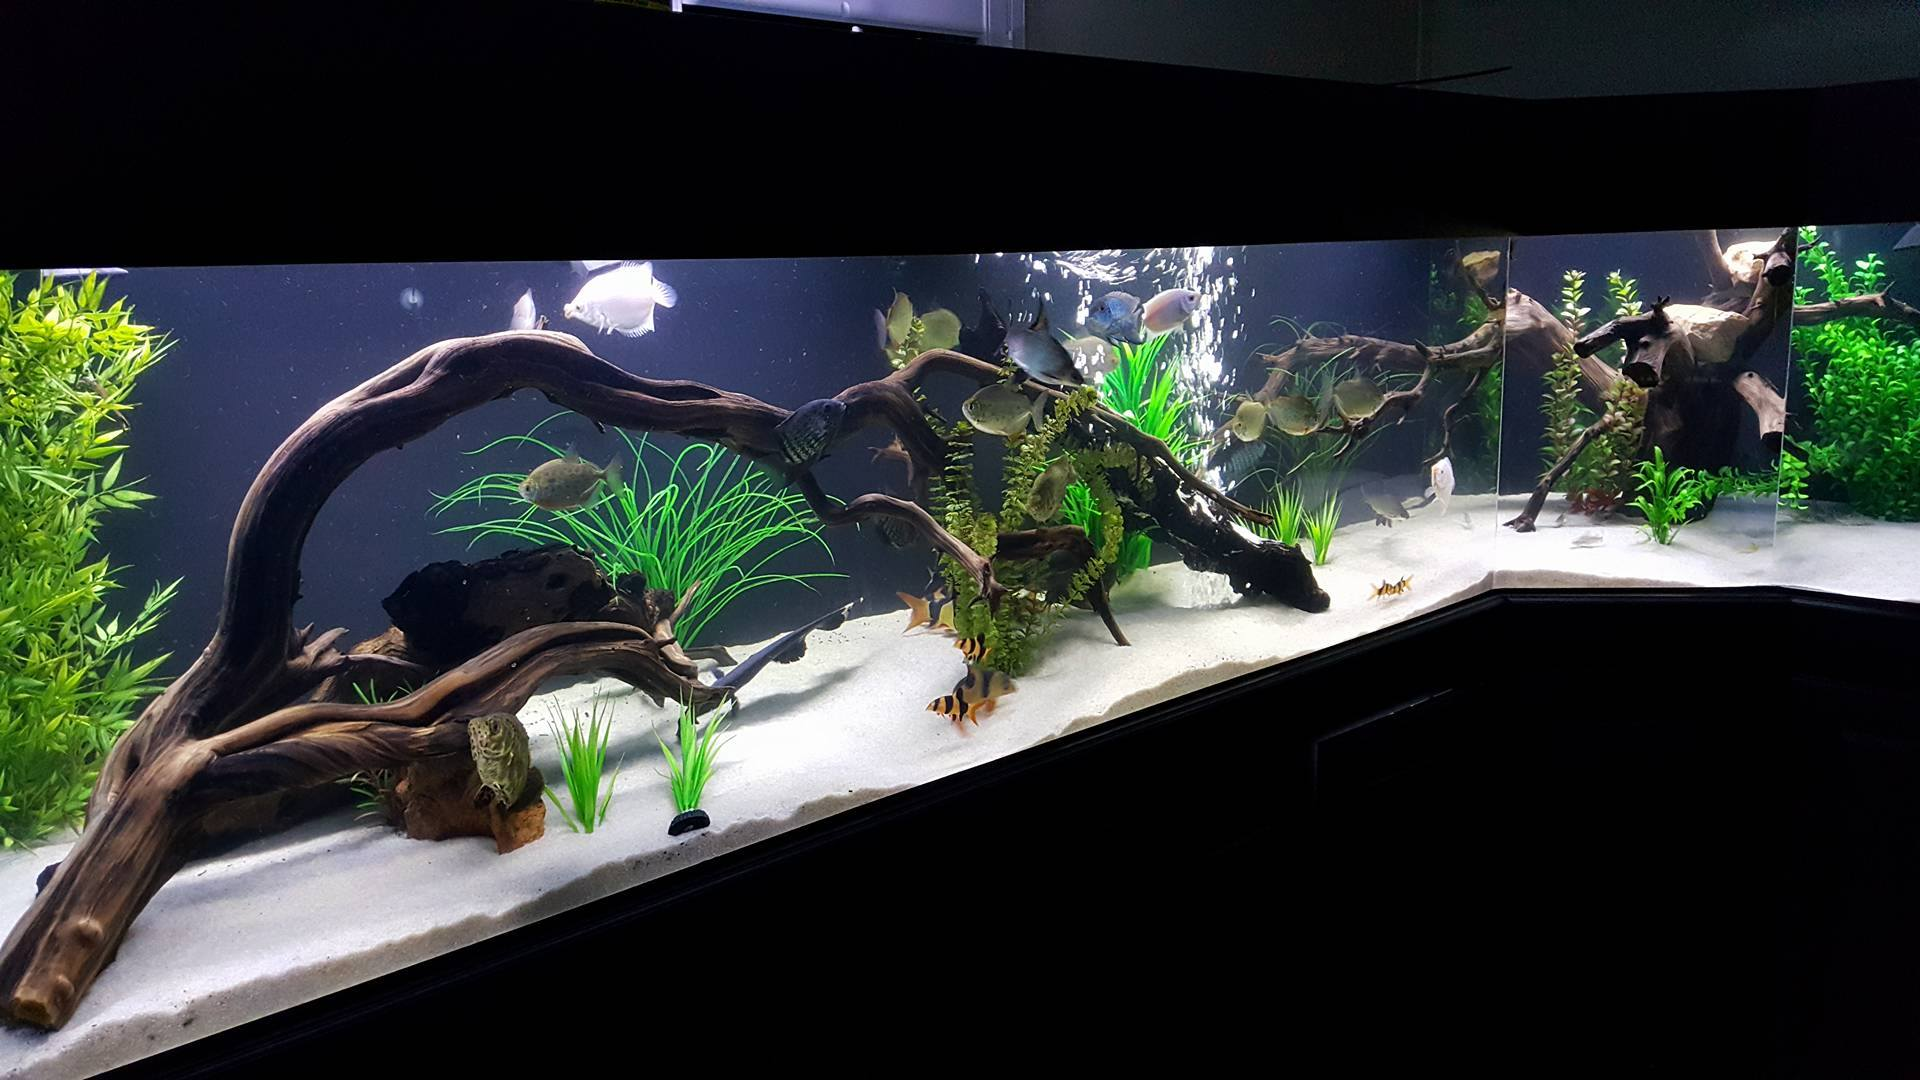 Manzanita-Driftwood com - Stunning Aquarium Driftwood, Stones, & Fish